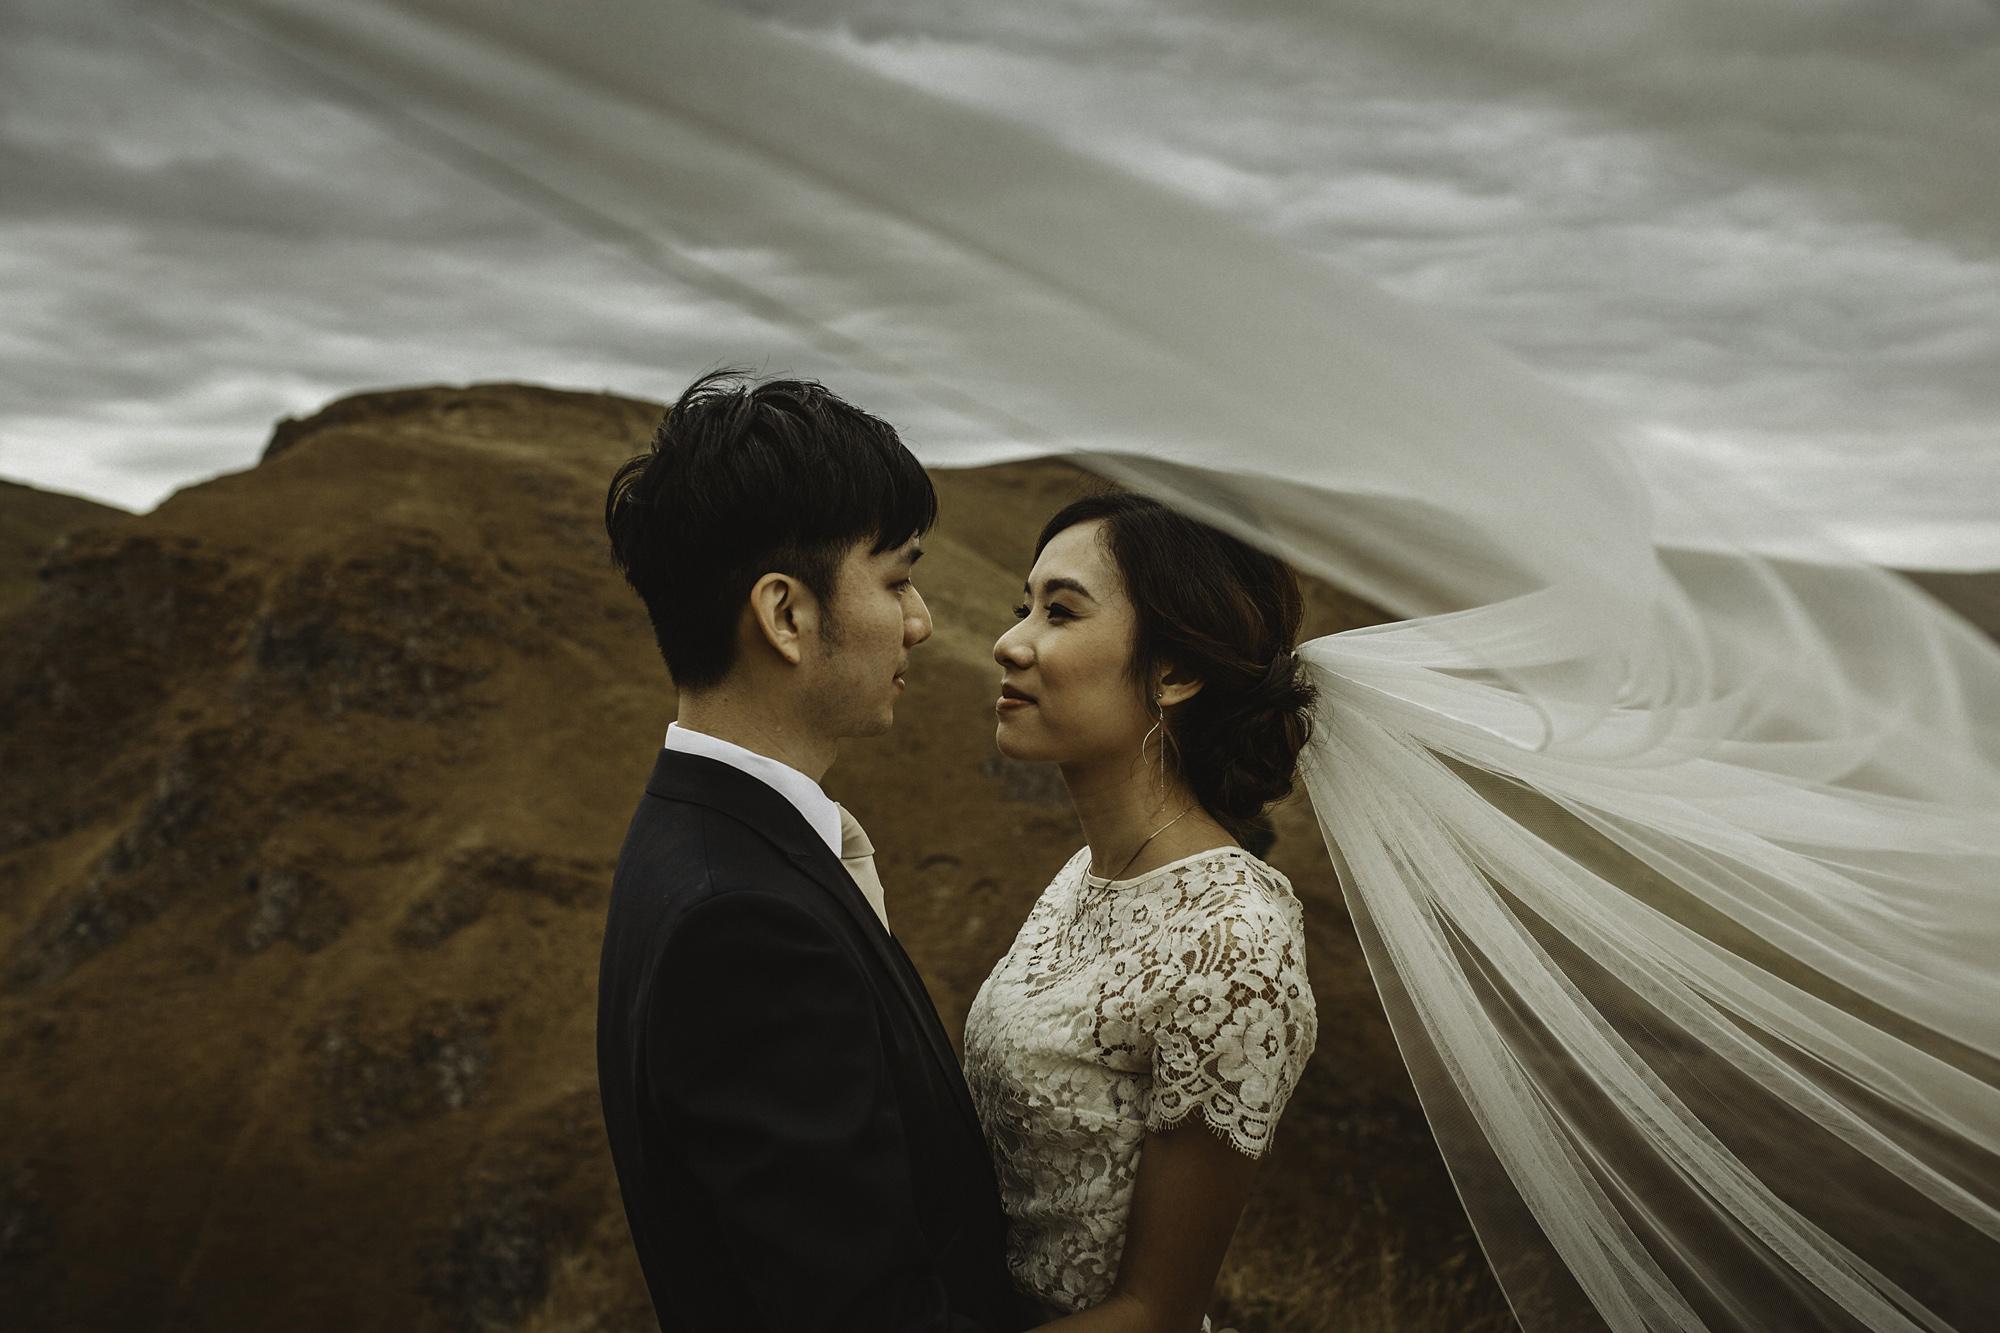 Kate-Beaumont-Wedding-Dress-Bridal-Separates-Peak-District-Shoot-2.jpg